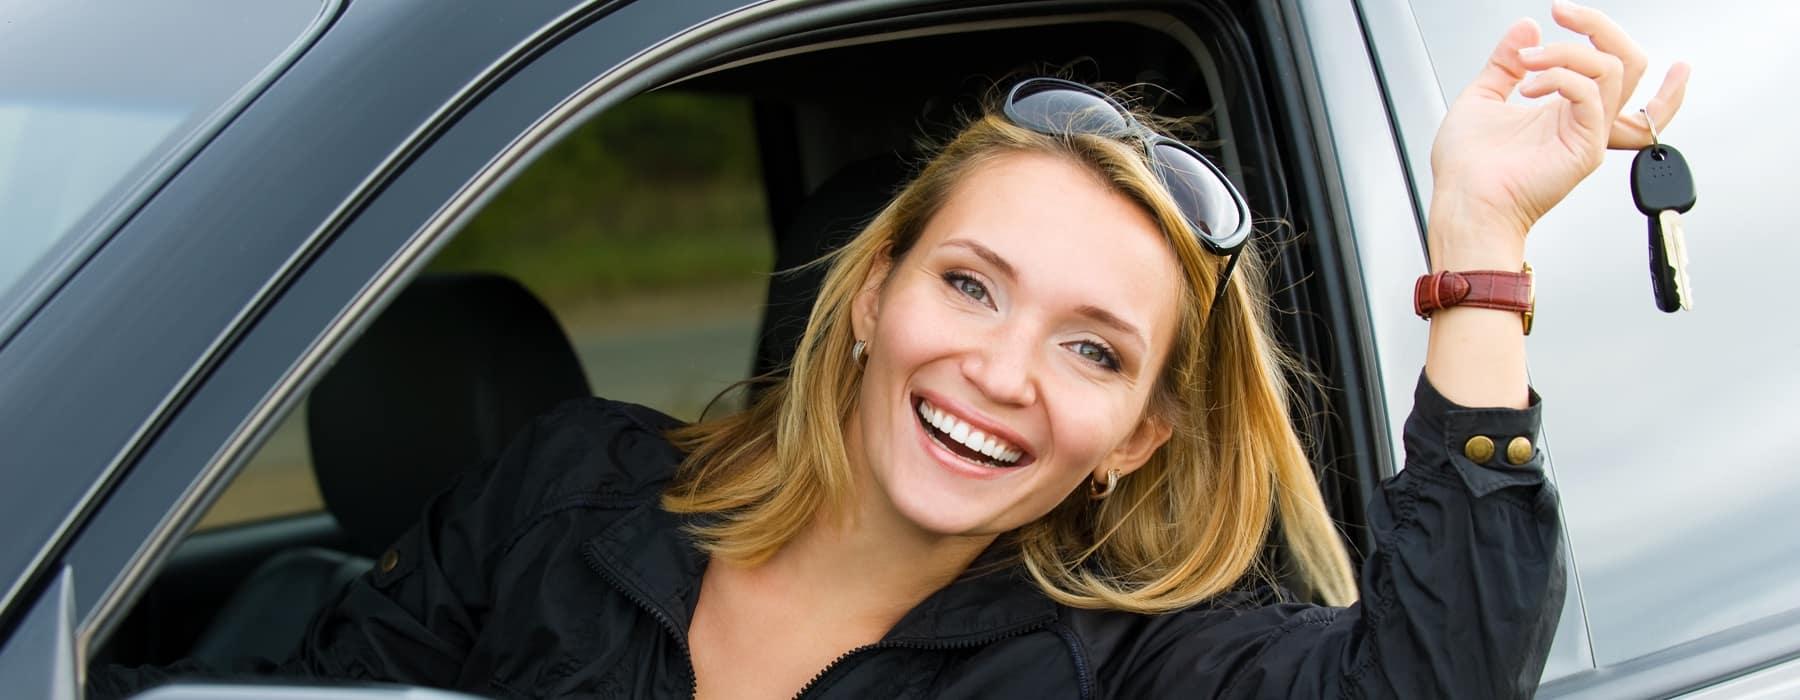 woman in car holding car keys